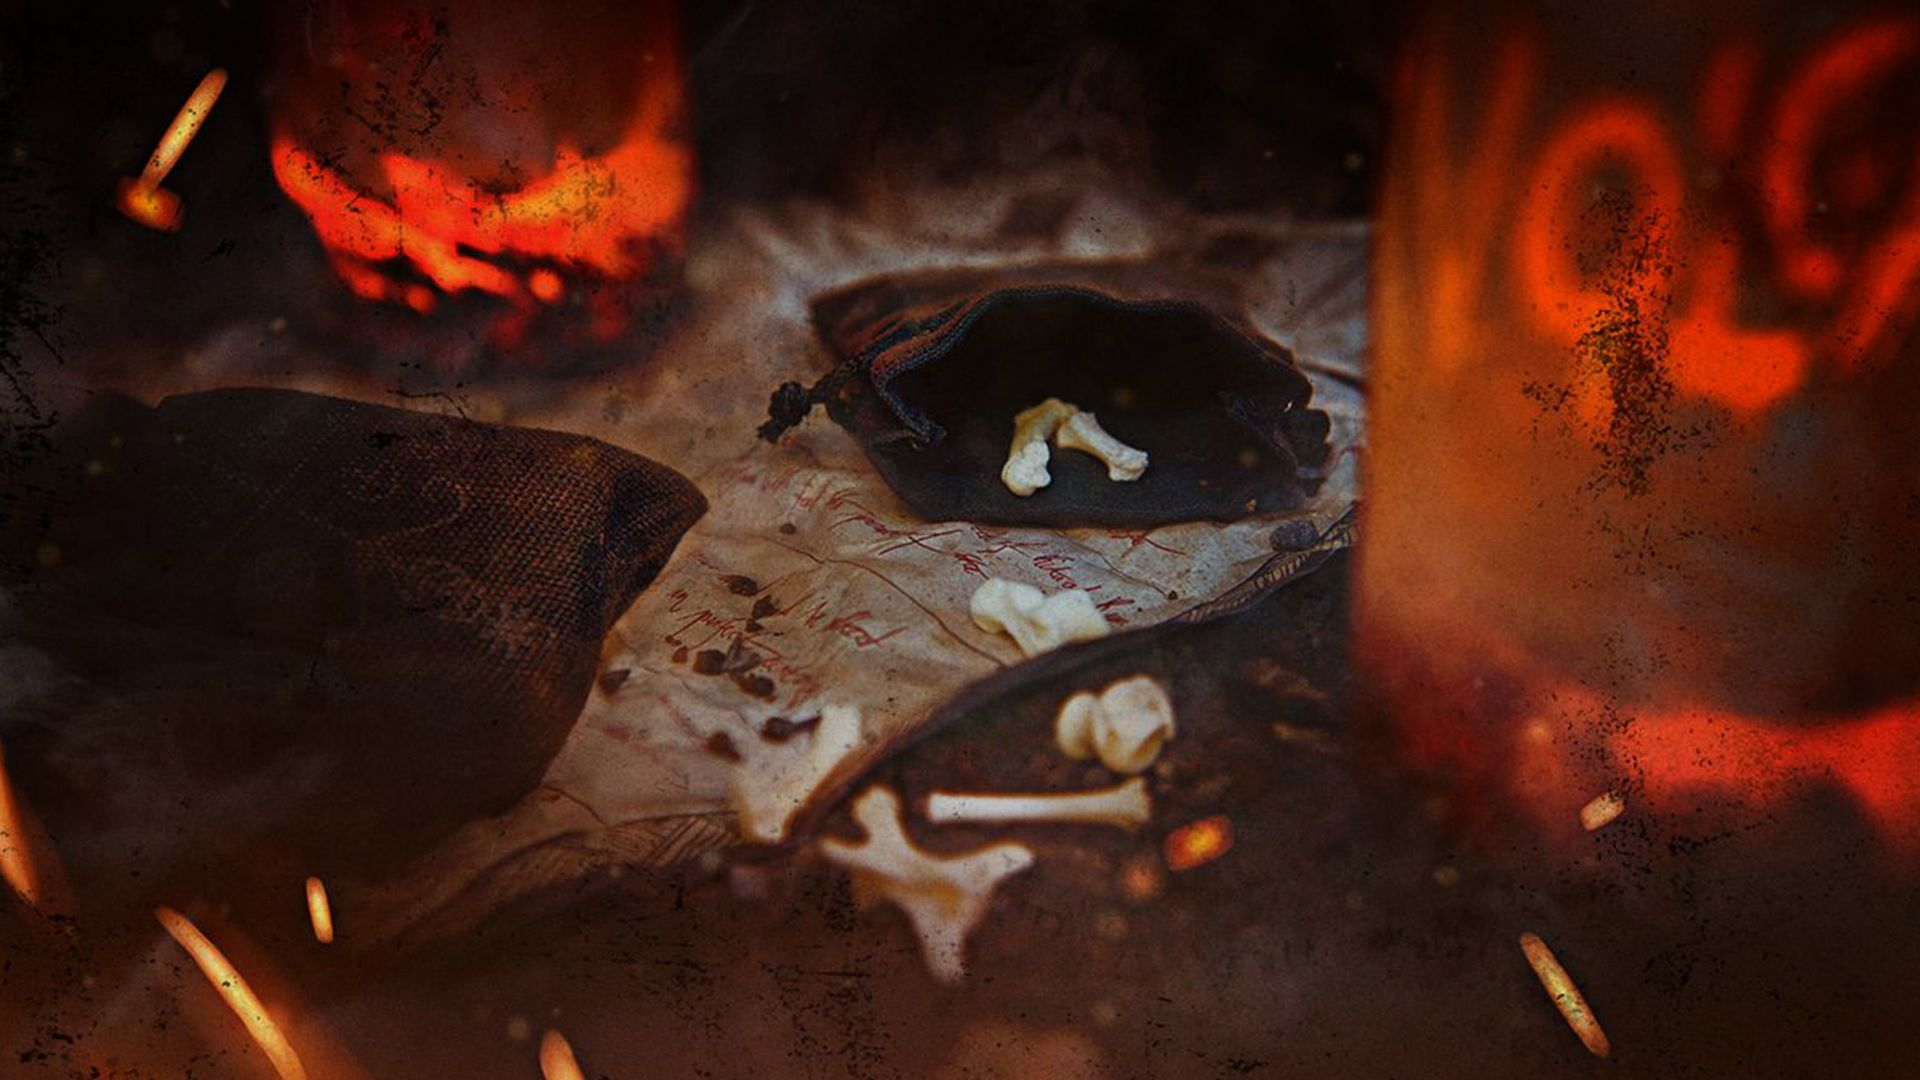 Braue :: Brand Design Experts - Voodoo Priest Volcano5.jpg